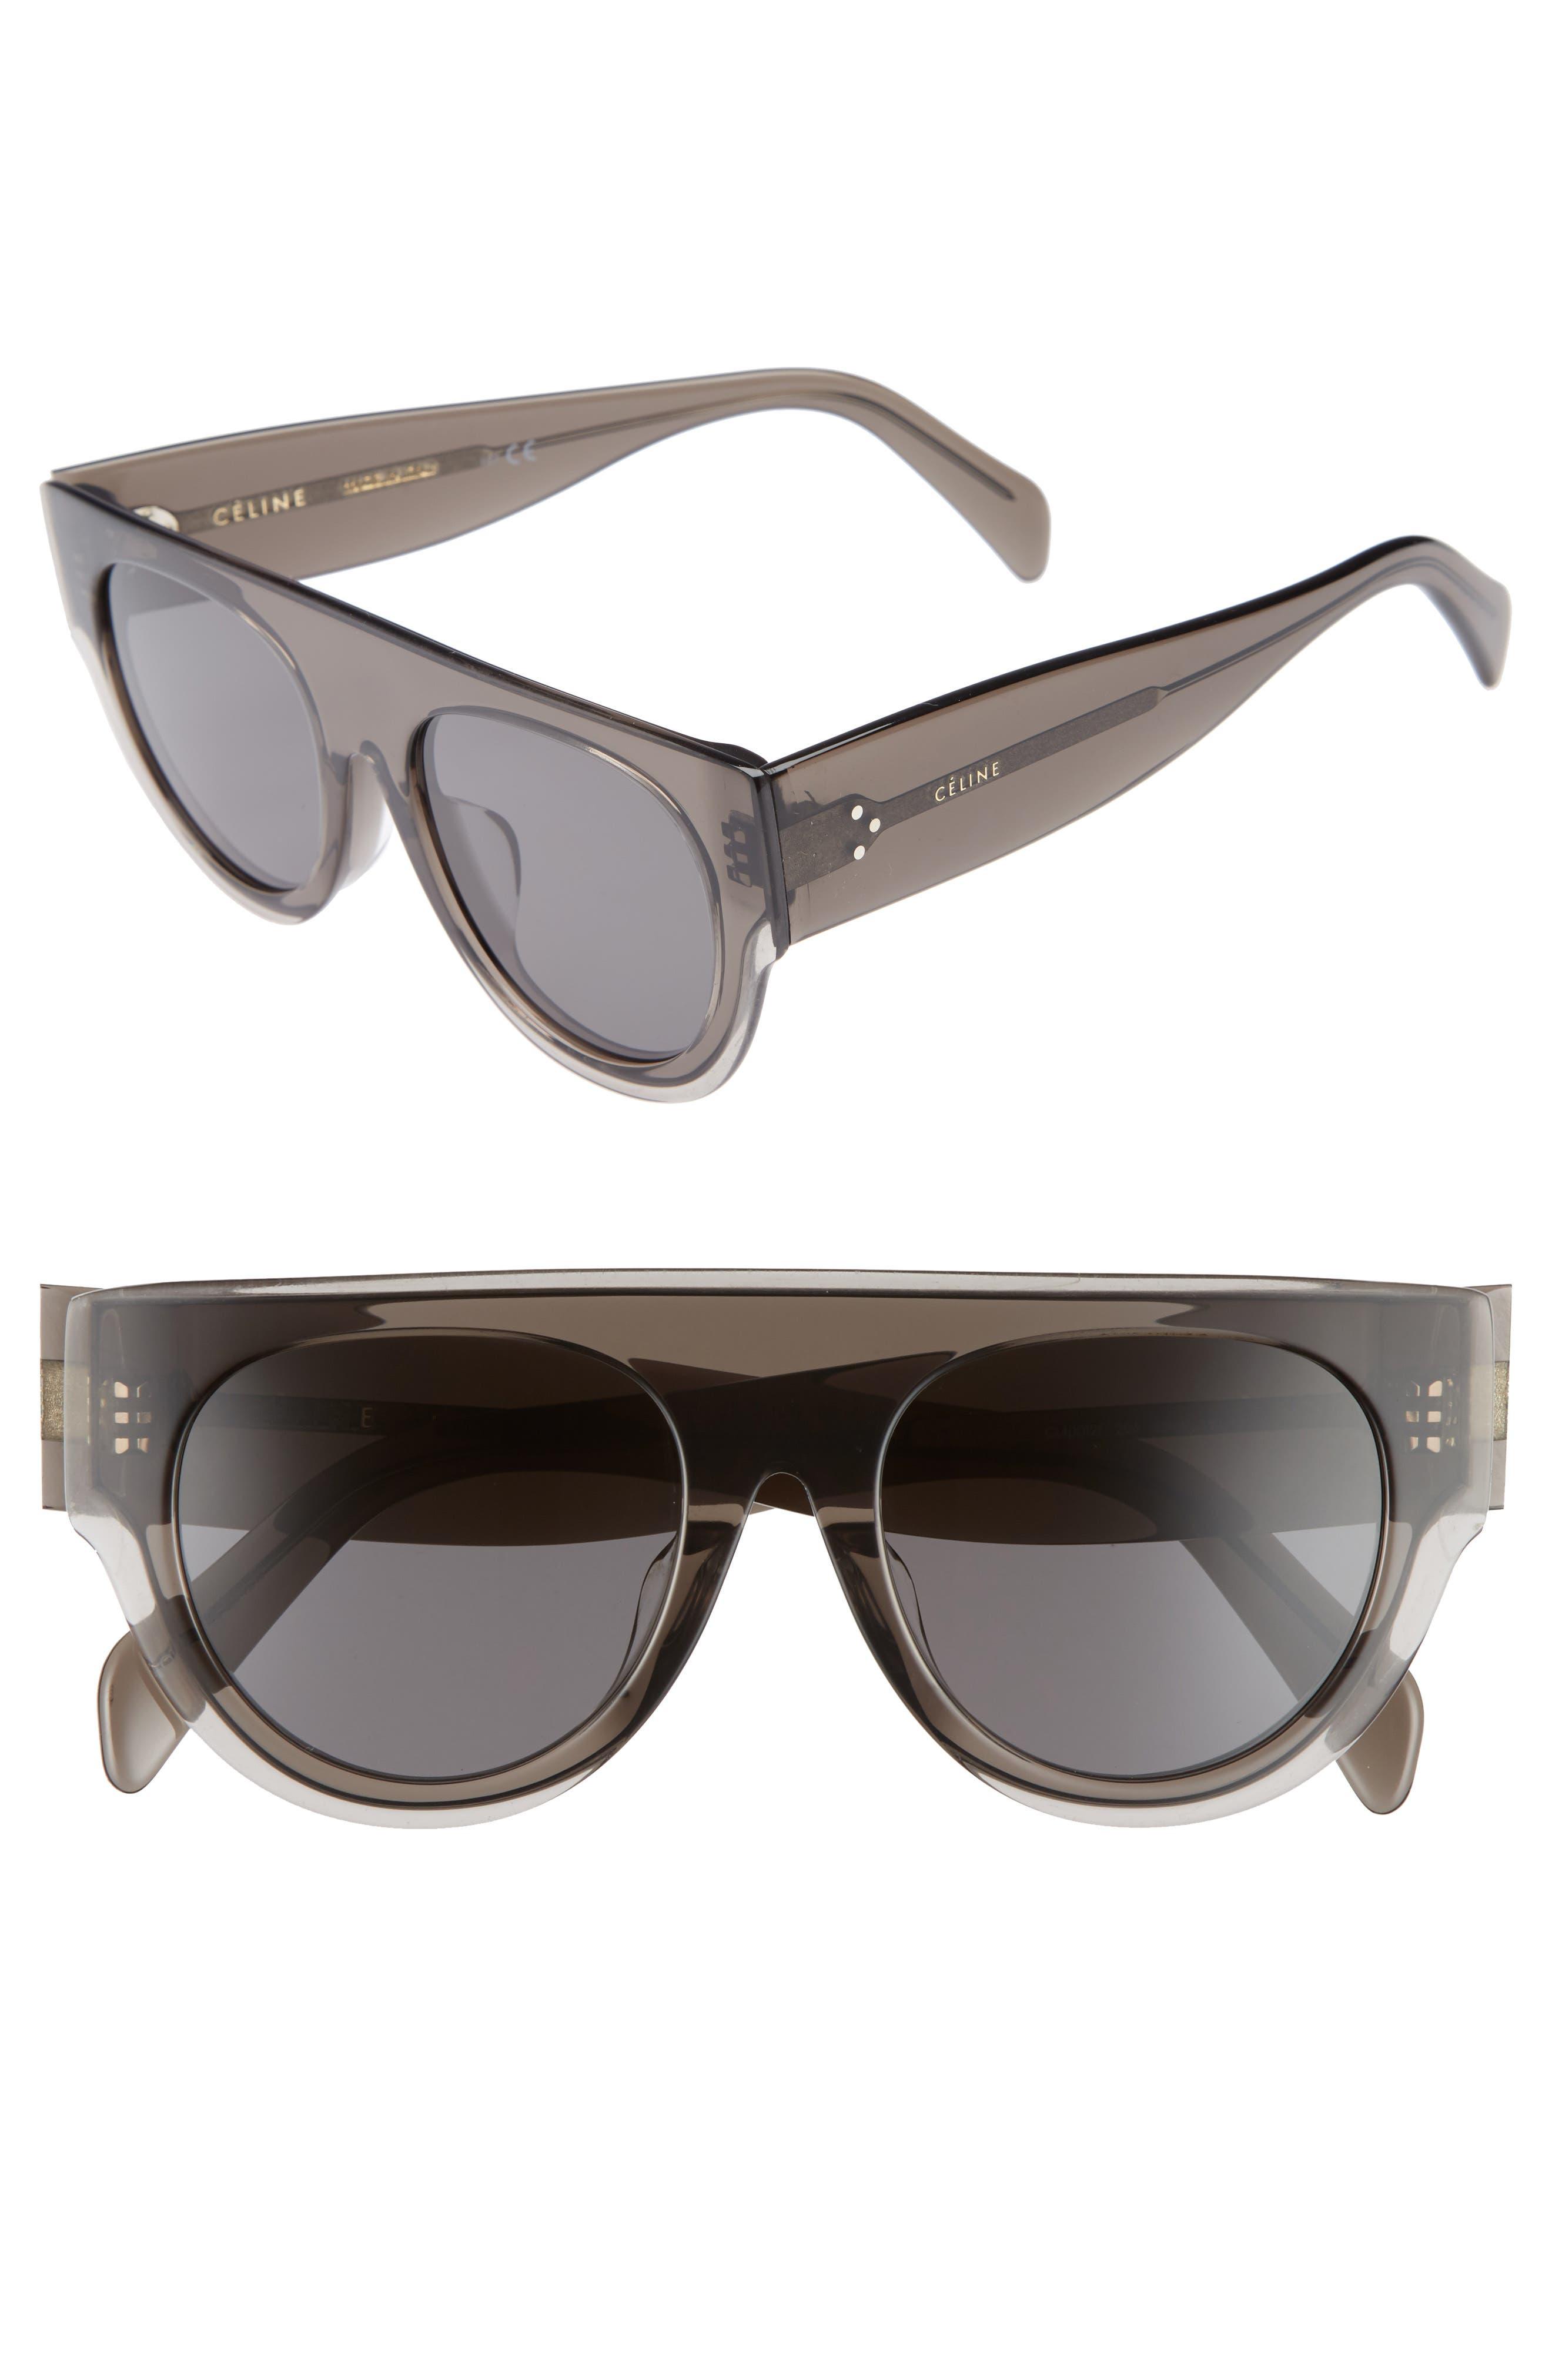 52mm Pilot Sunglasses,                             Main thumbnail 1, color,                             DARK GREY/ SMOKE